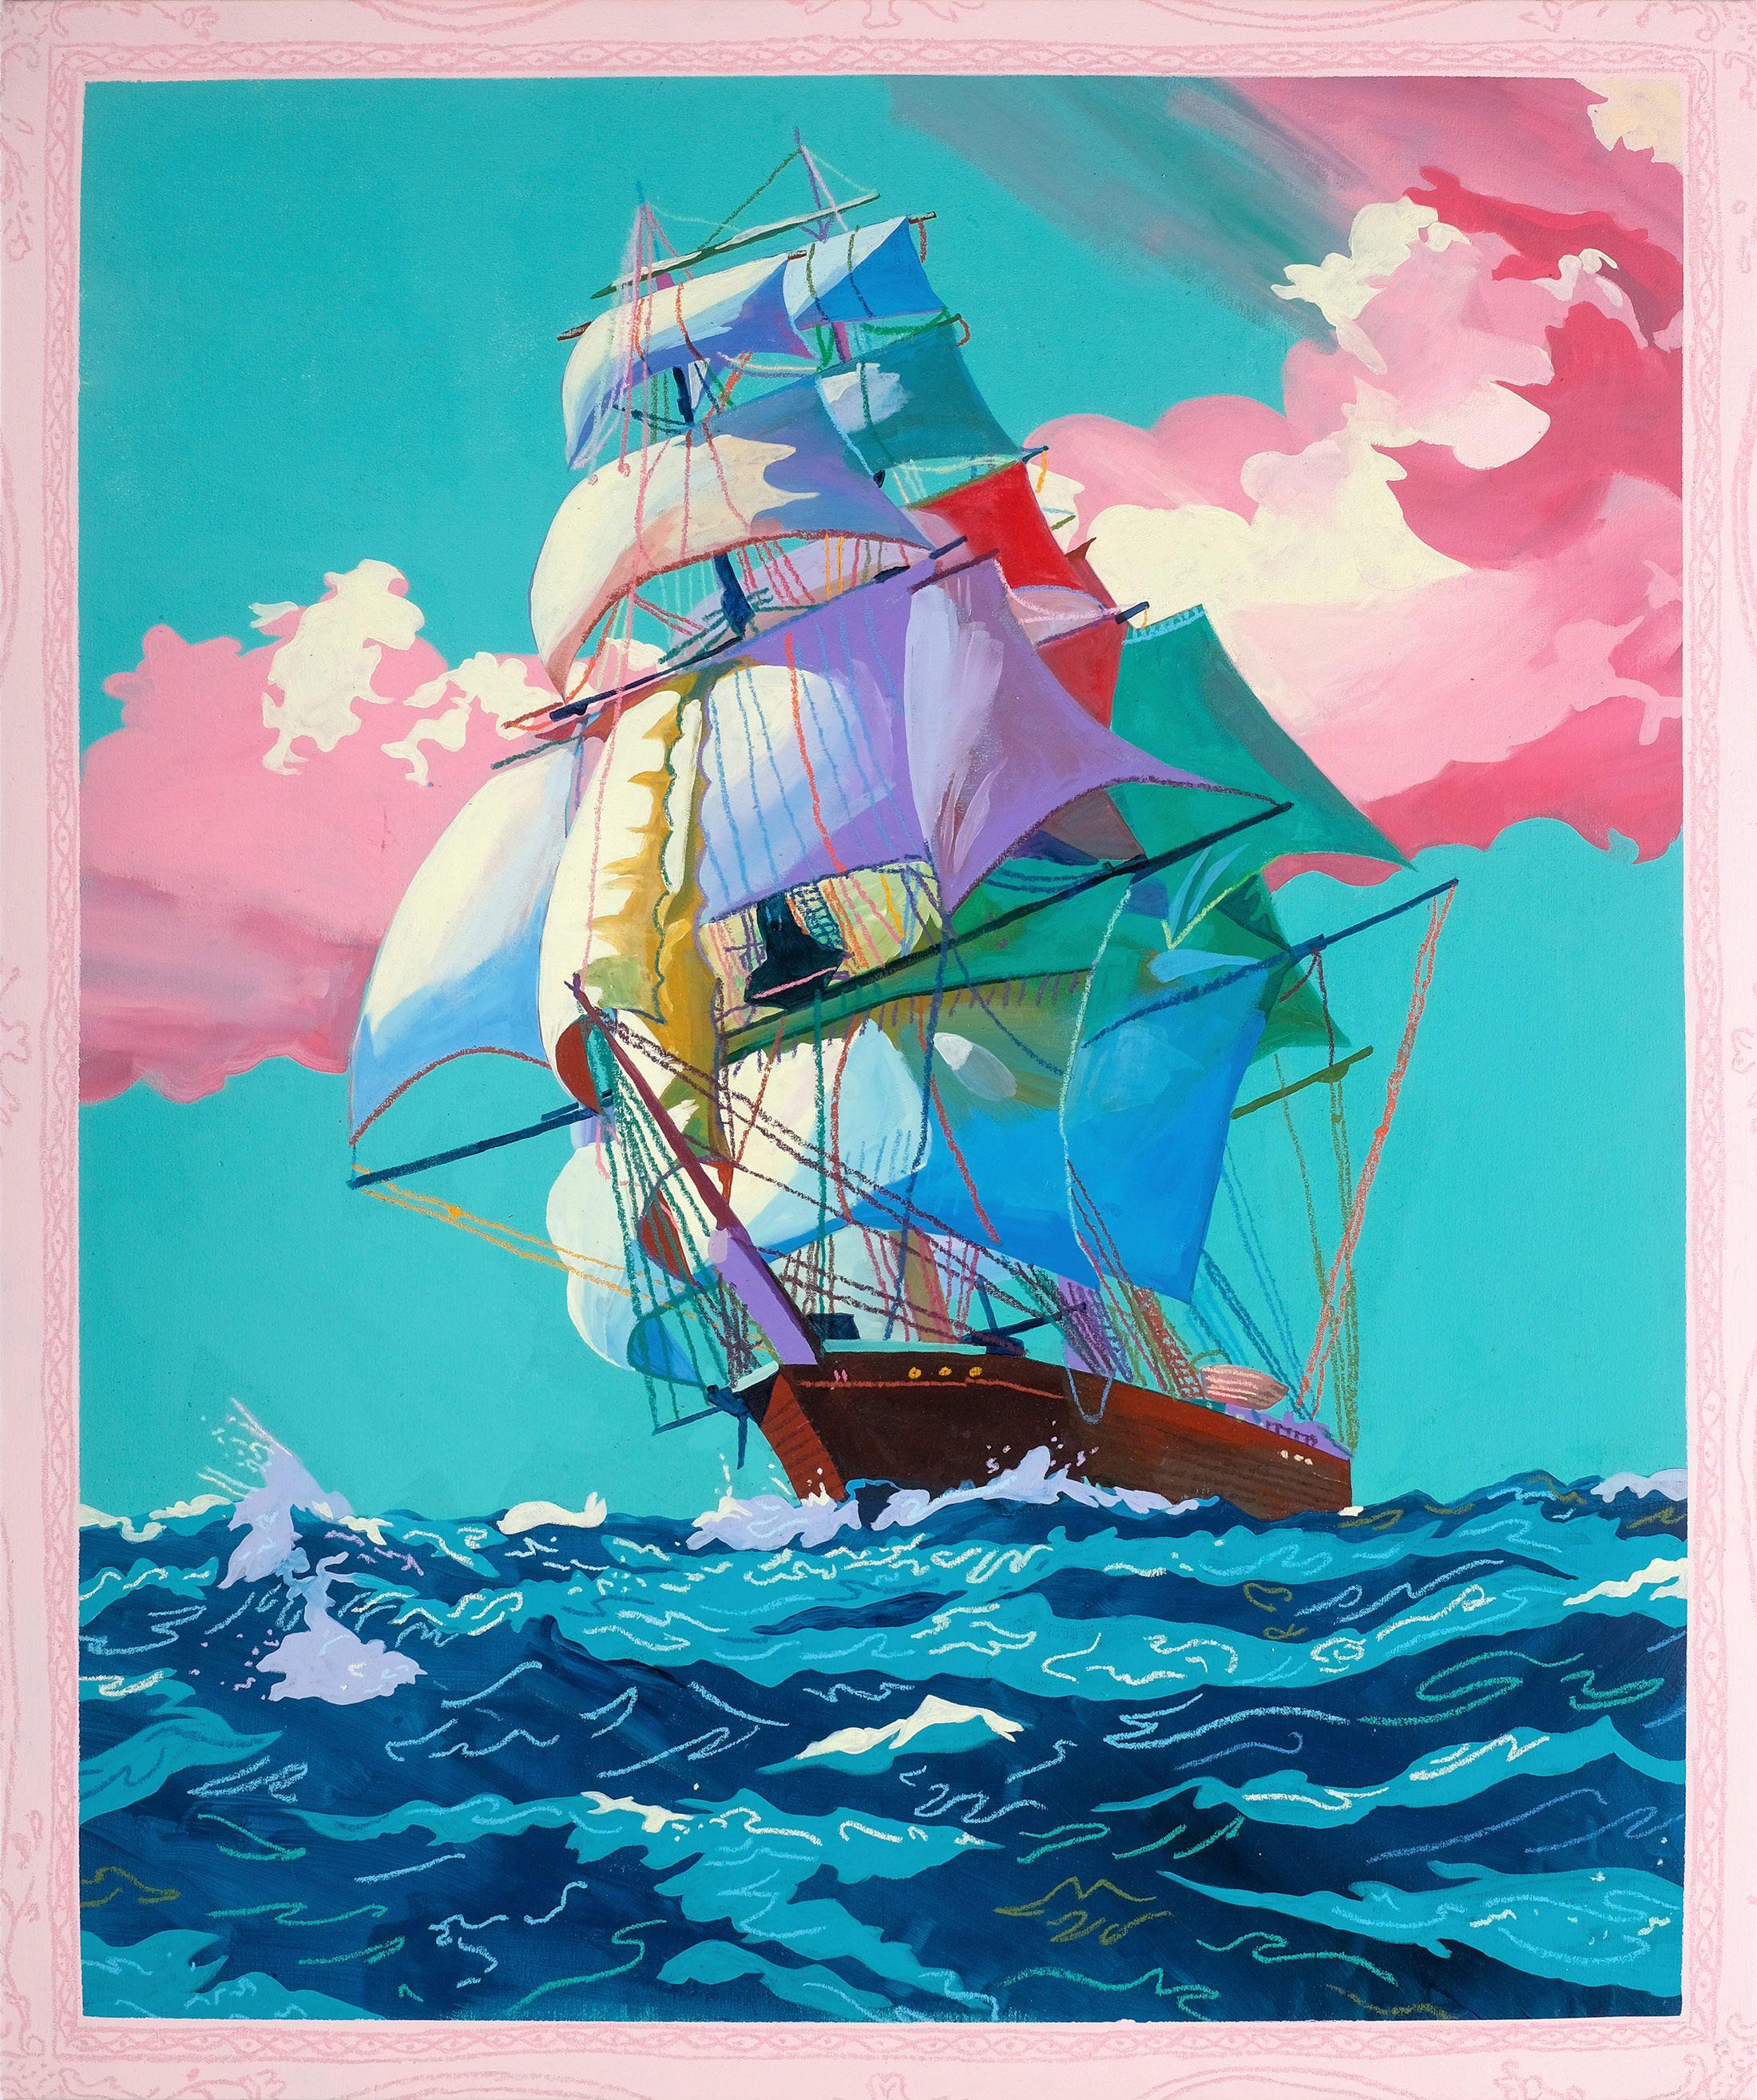 Andy Dixon NUVO Ship paintings, Cool paintings, Artwork